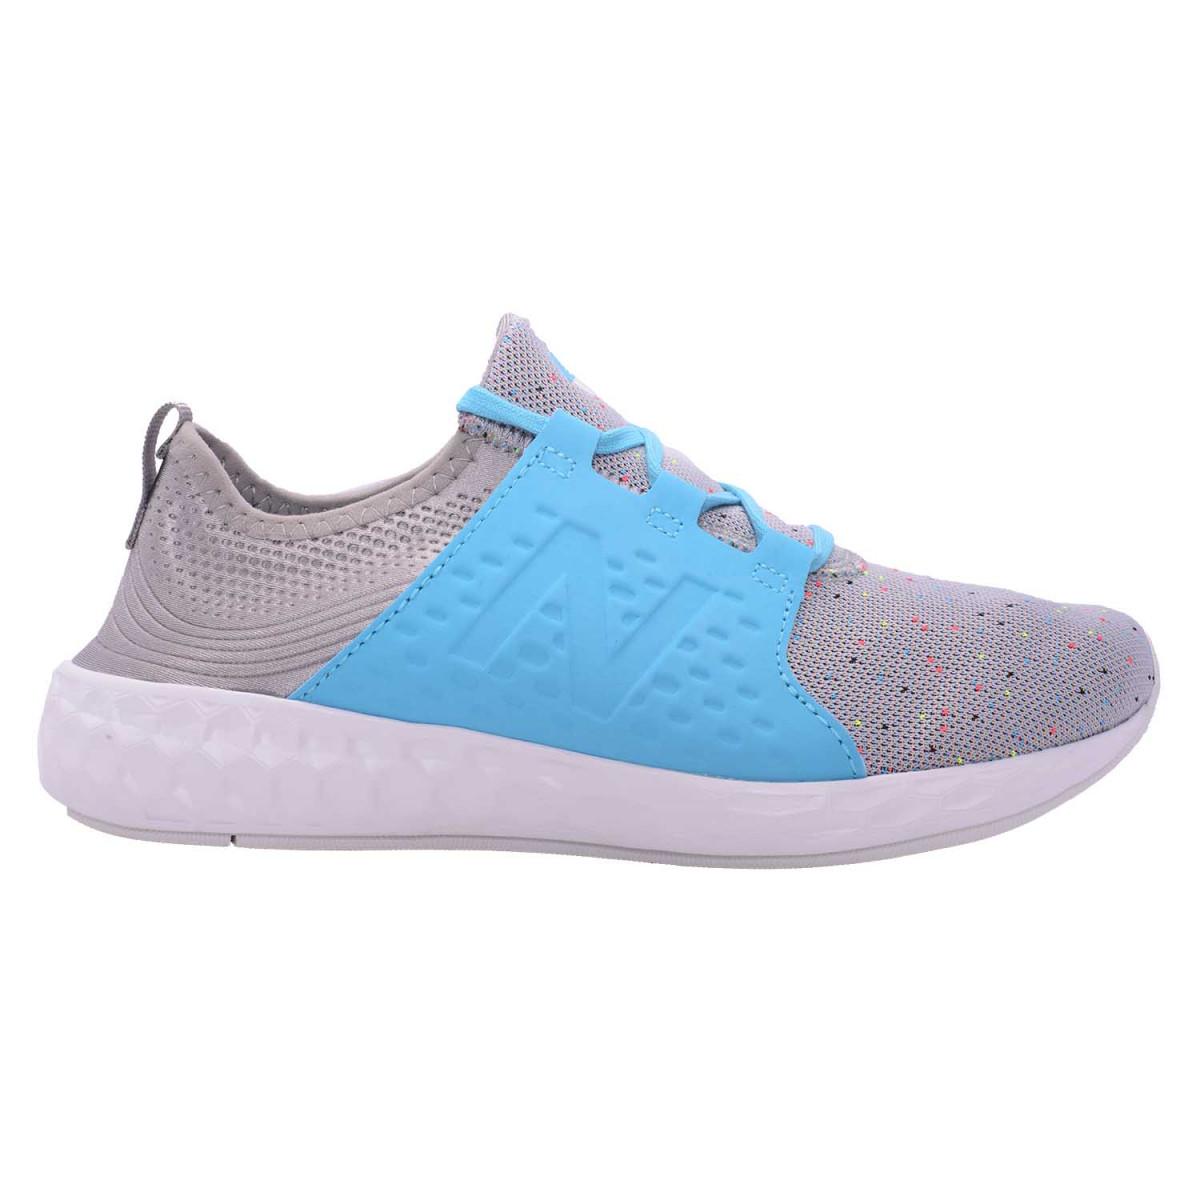 Zapatillas New Balance Cruz